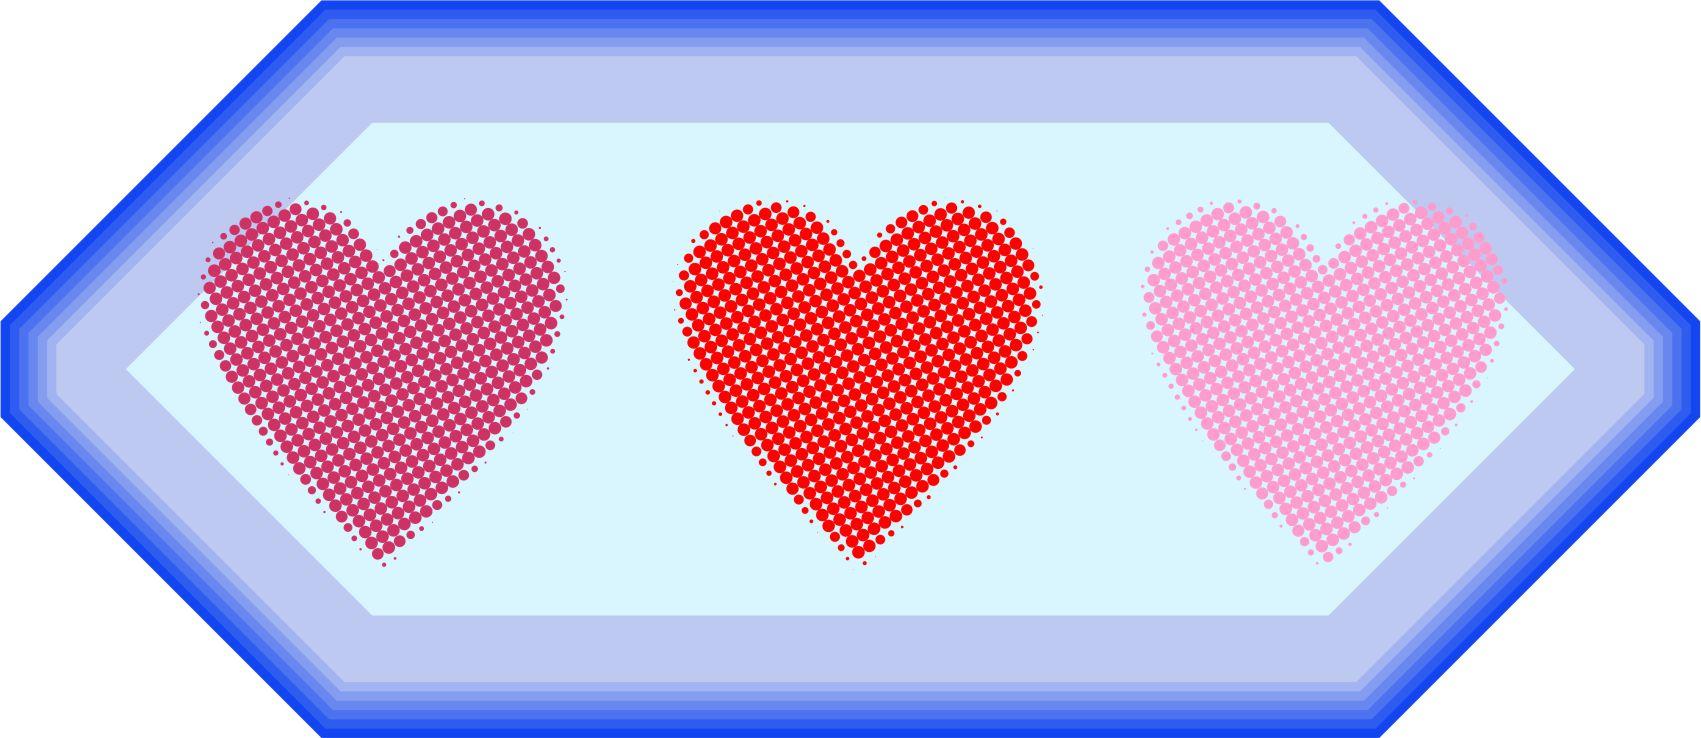 Pointilized Heart Sampler